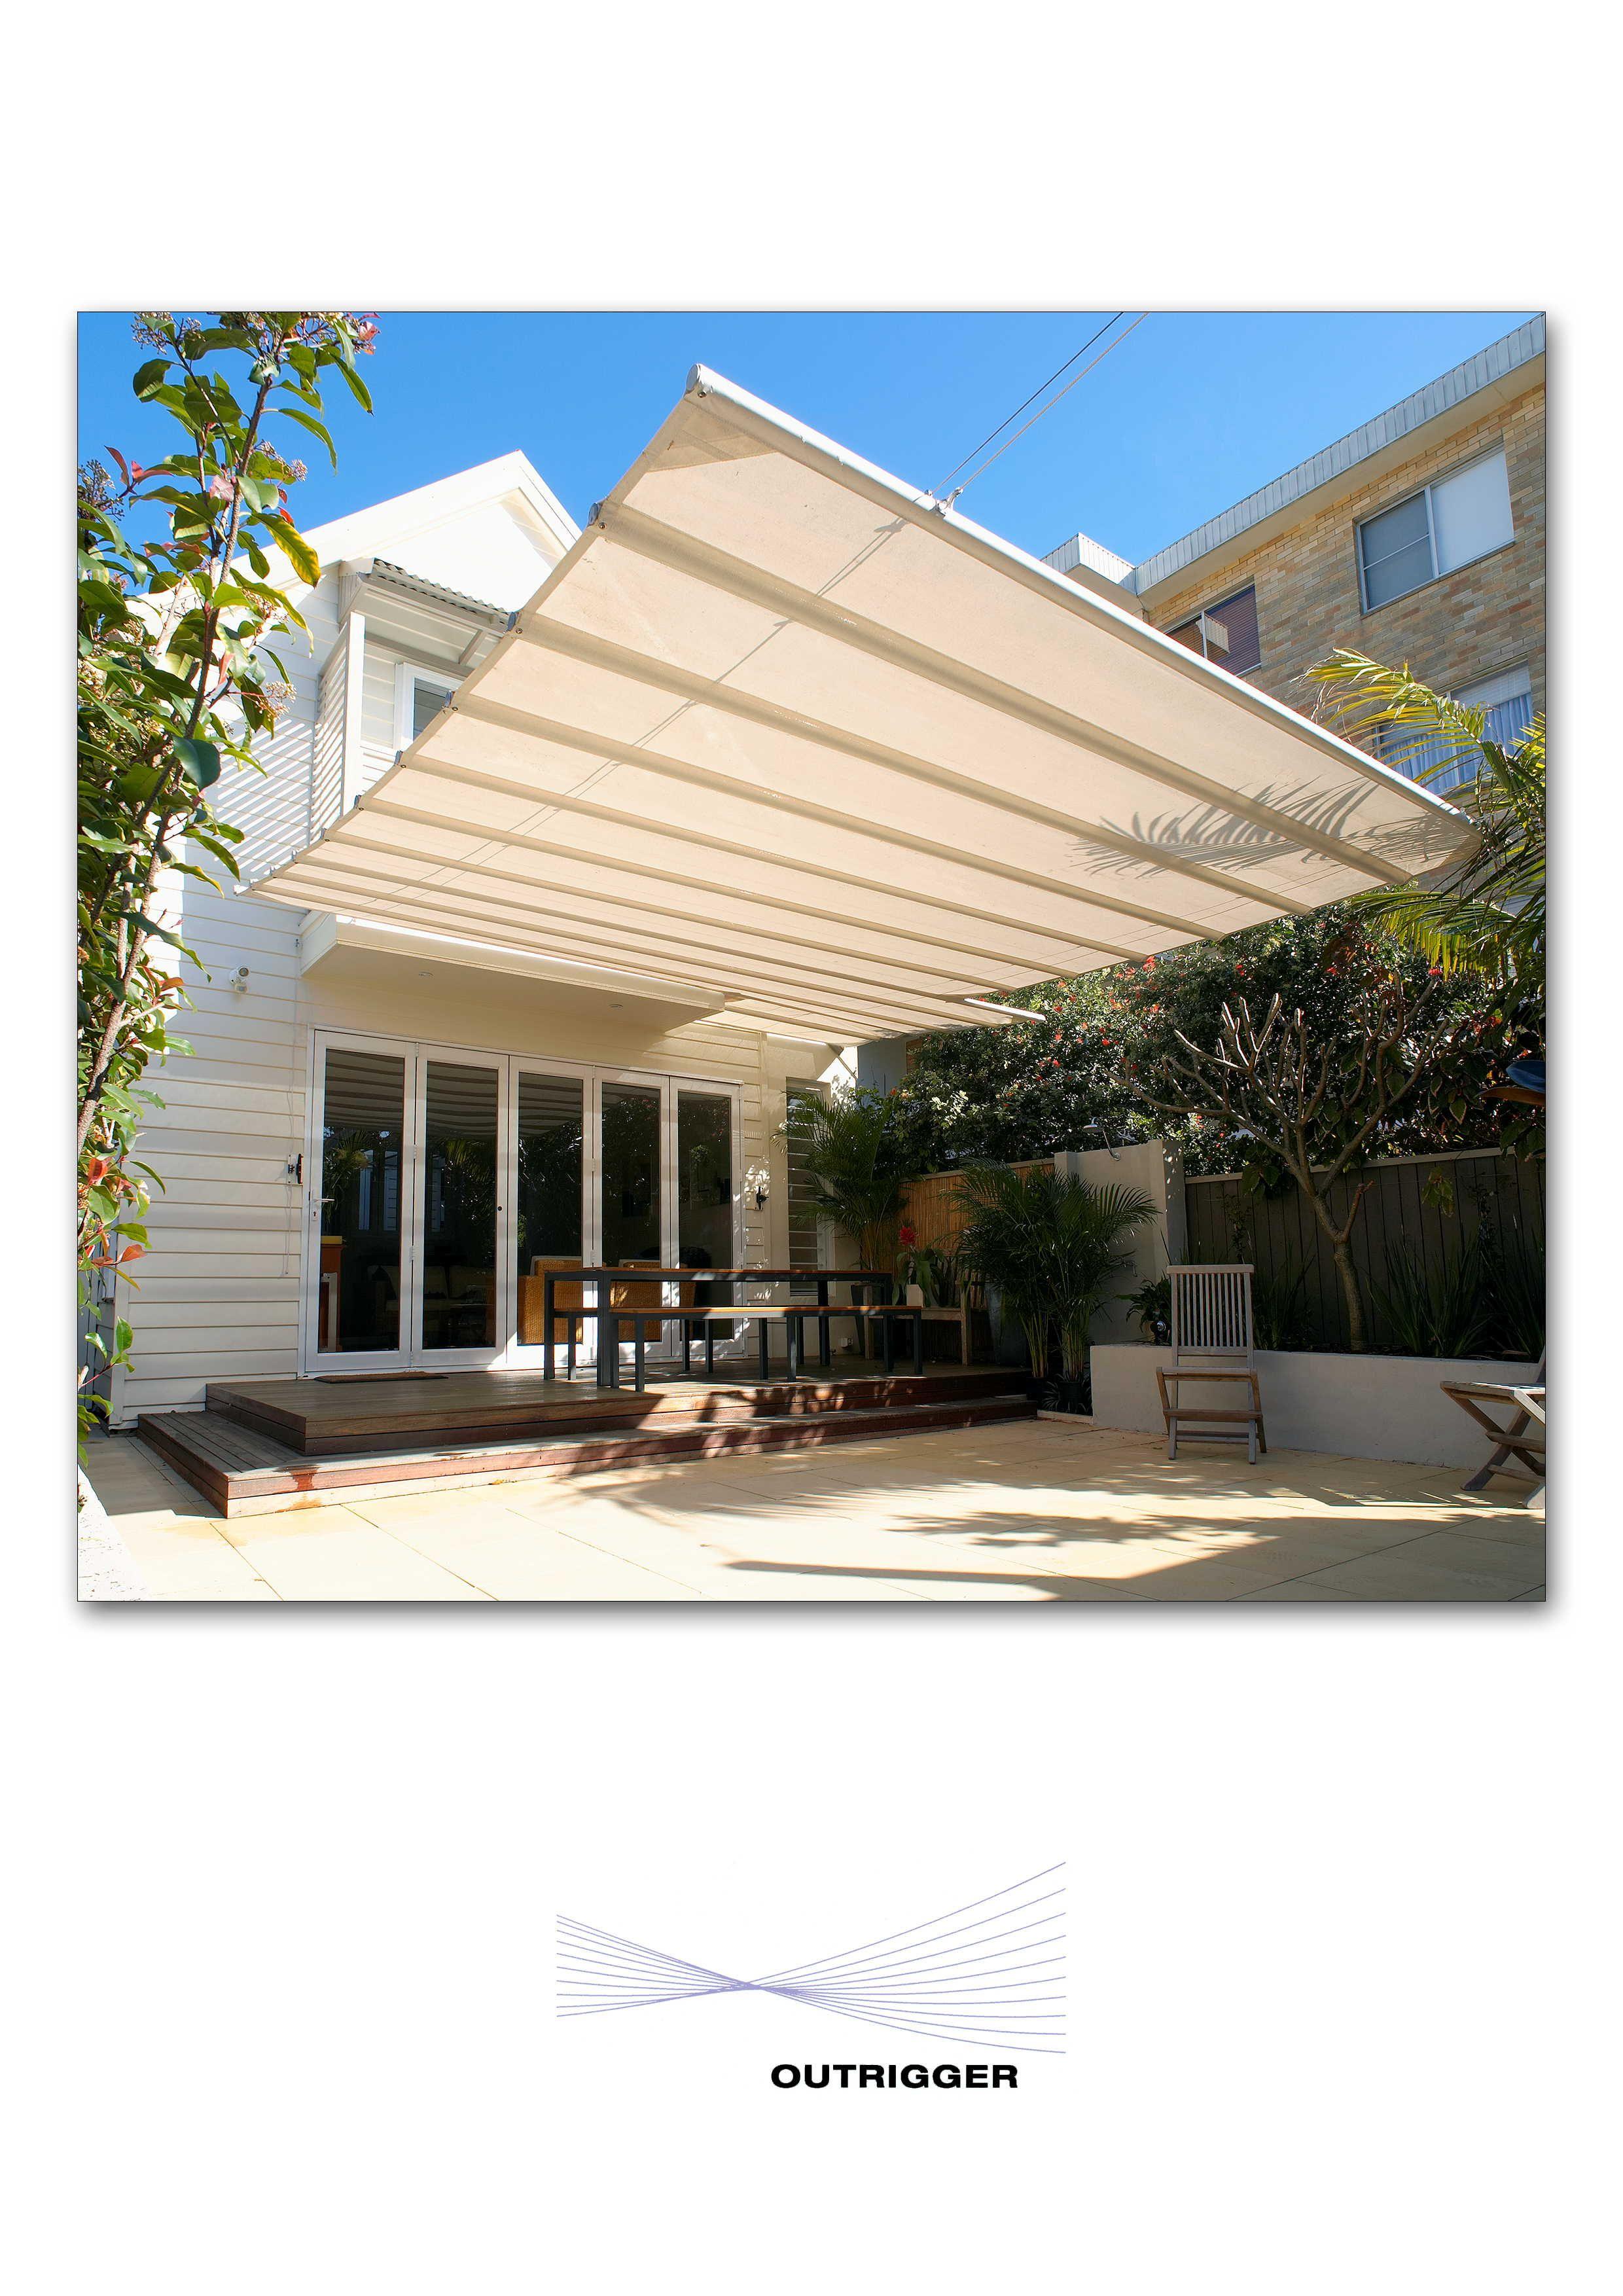 Retracting, concertina style awning Aluminum patio